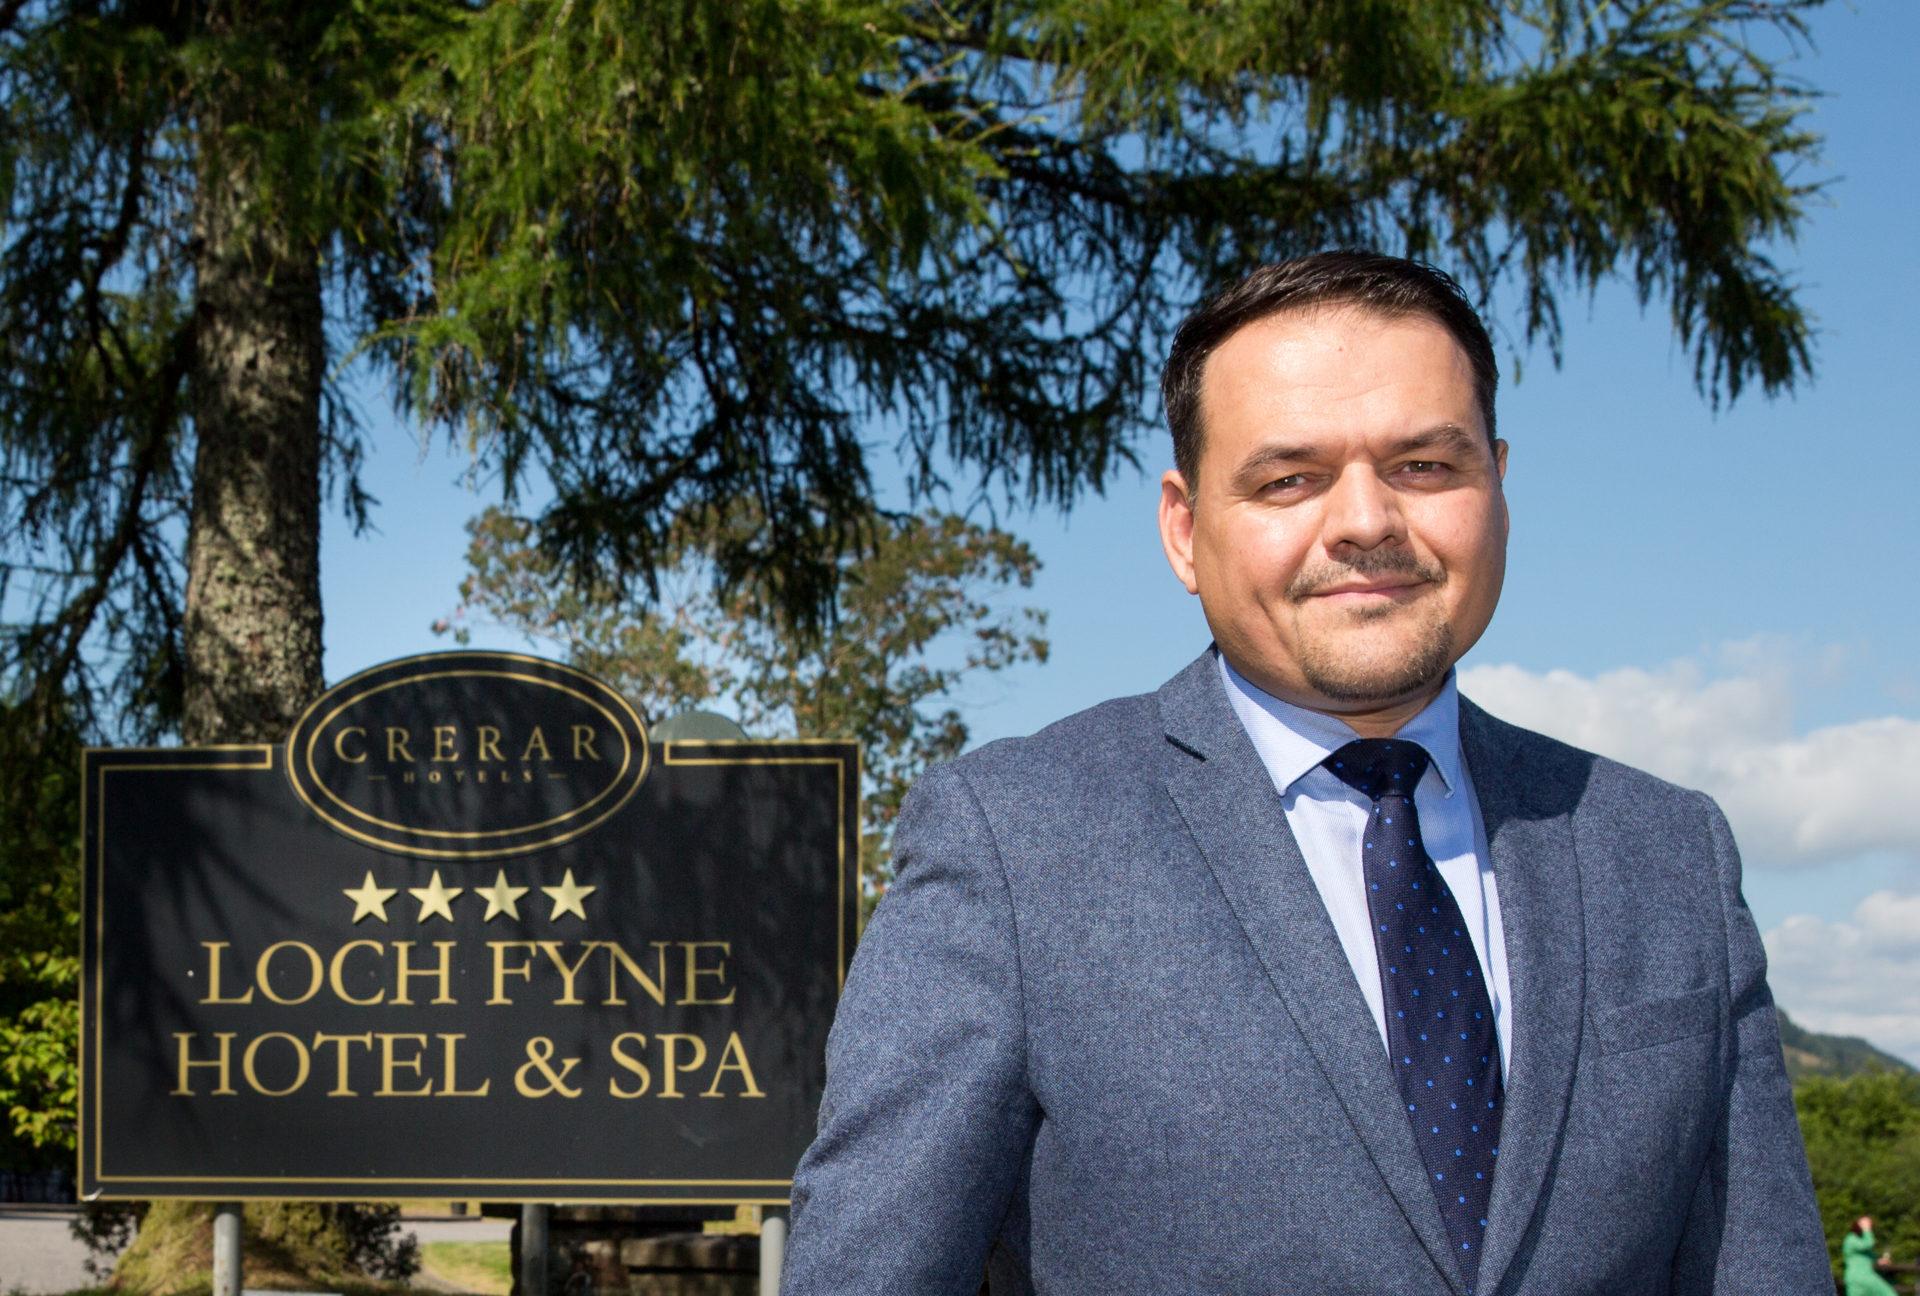 Crerar Hotels  CEO Chris Wayne-Wills outside the Loch Fyne Hotel and Spa.